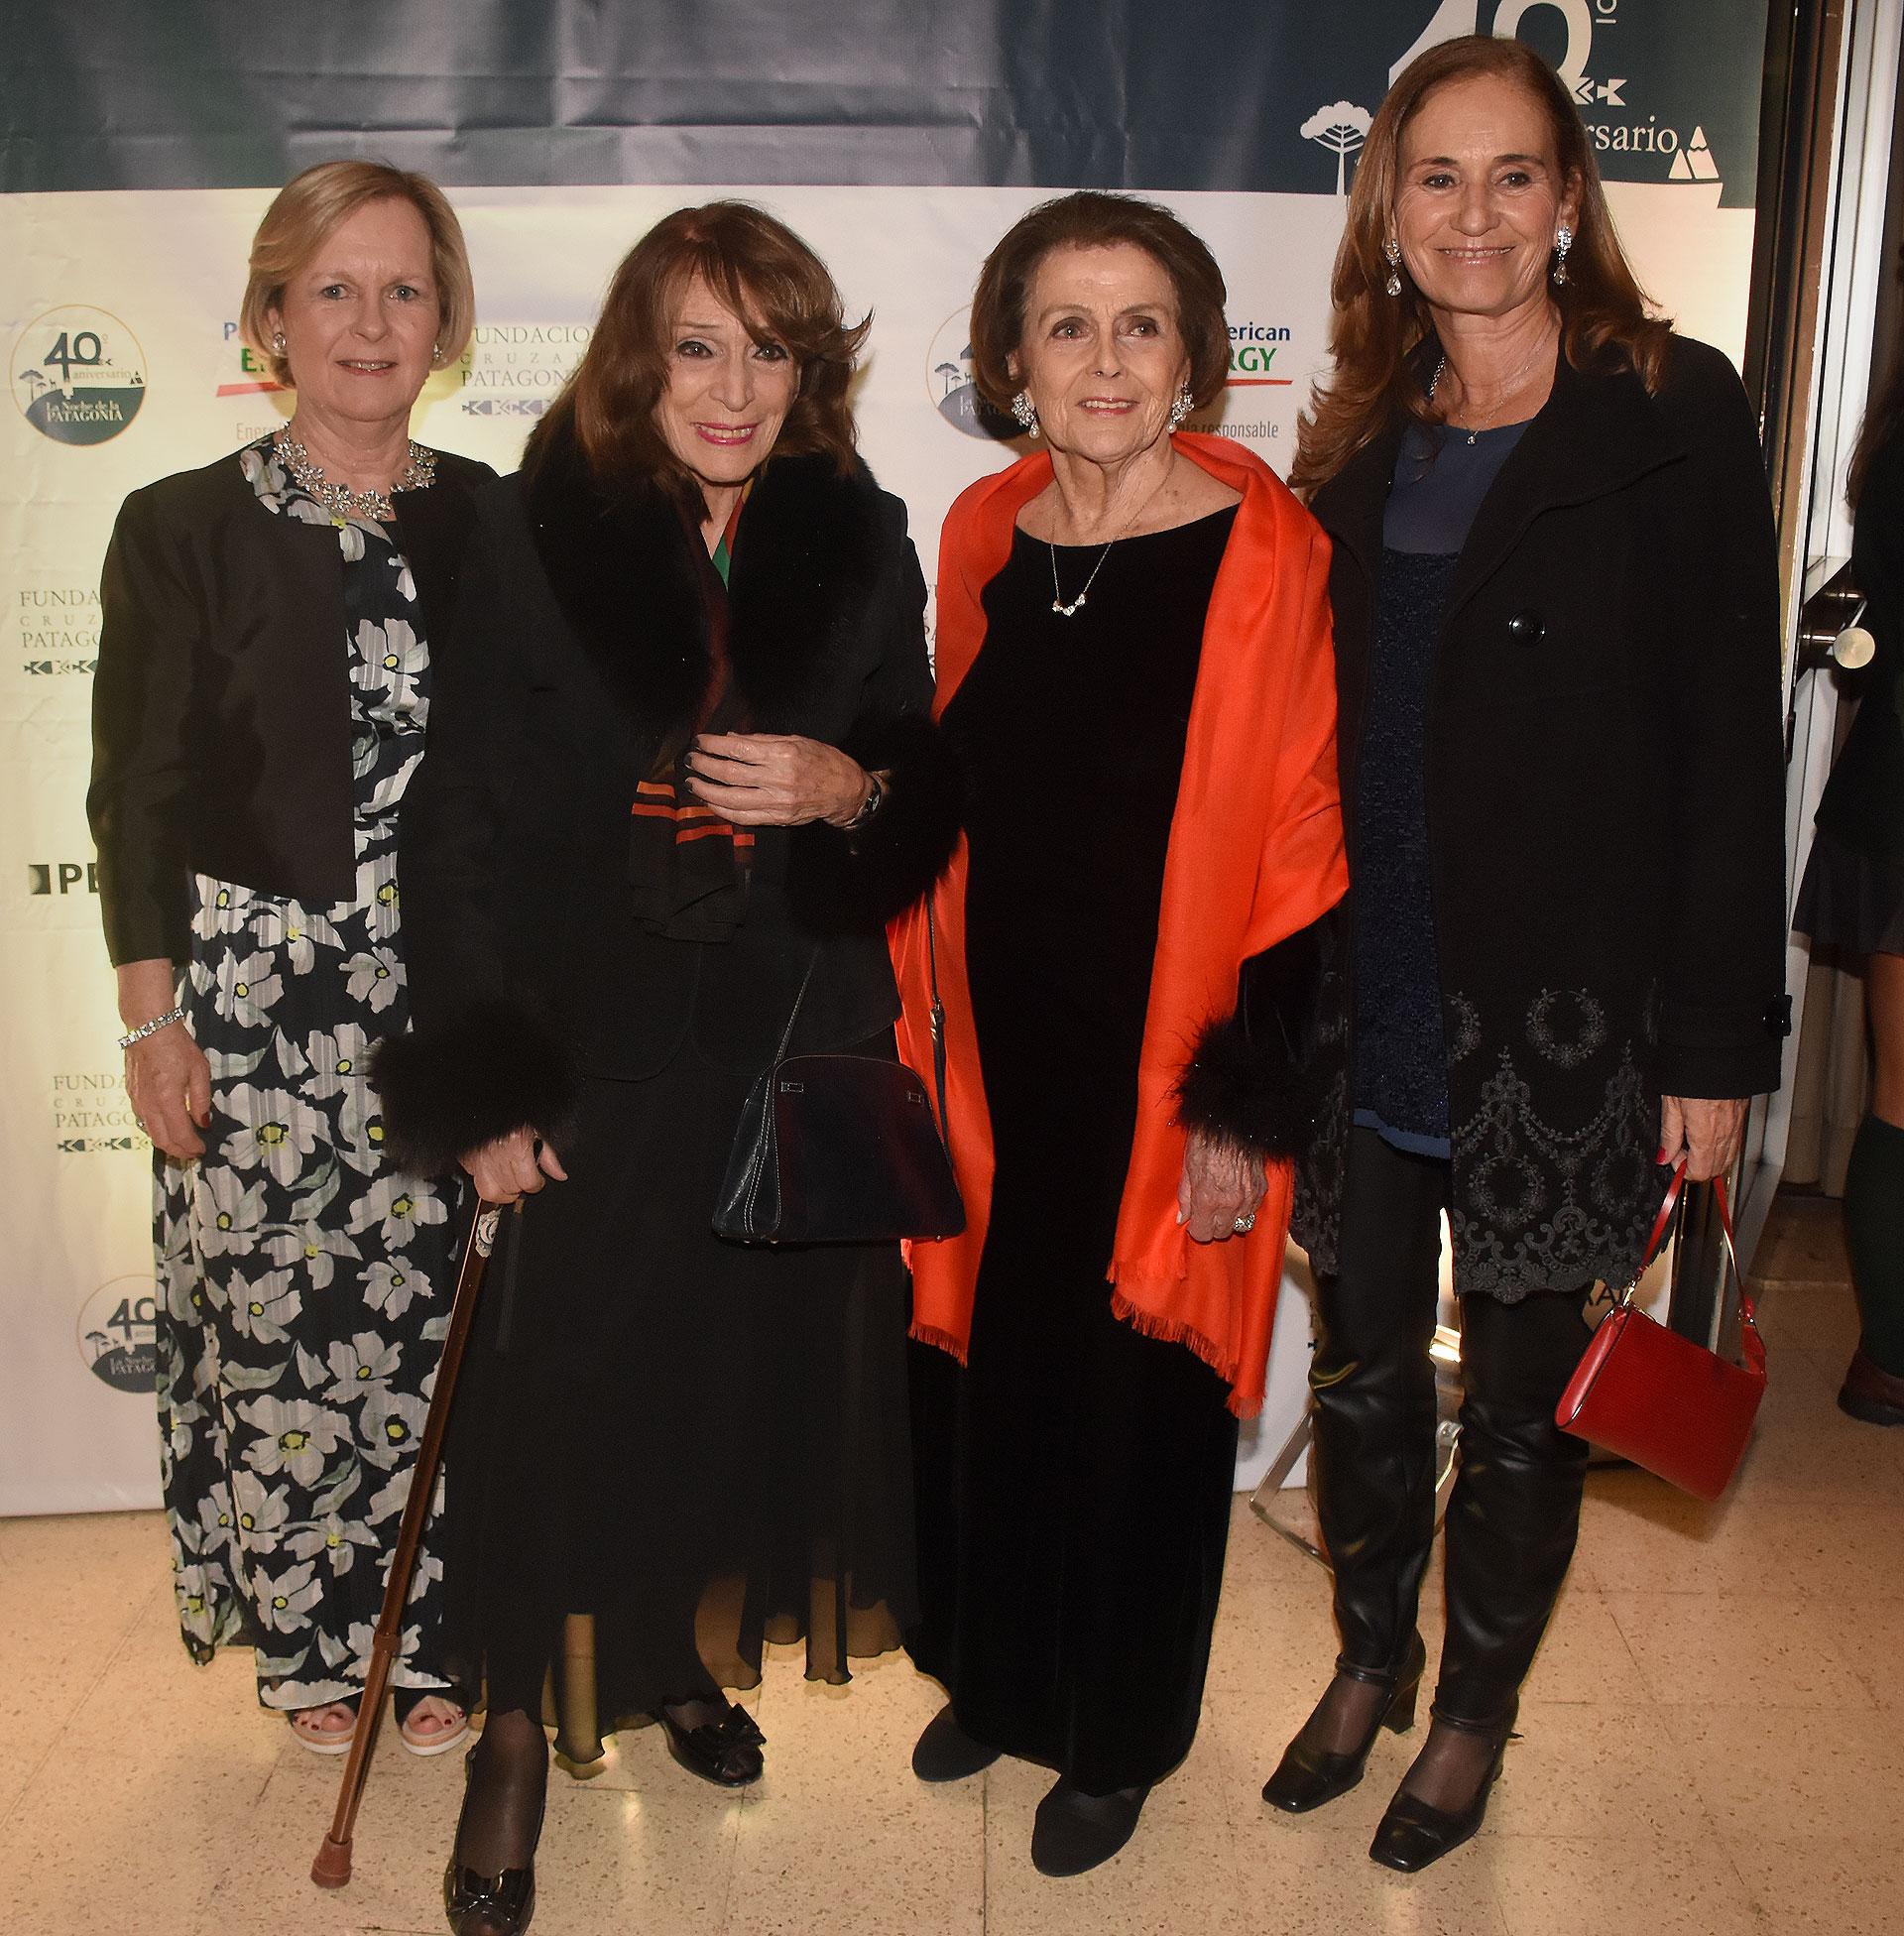 Marina Larivière, Magdalena Ruíz Guiñazú, Meme Larivière y Paula Doretti